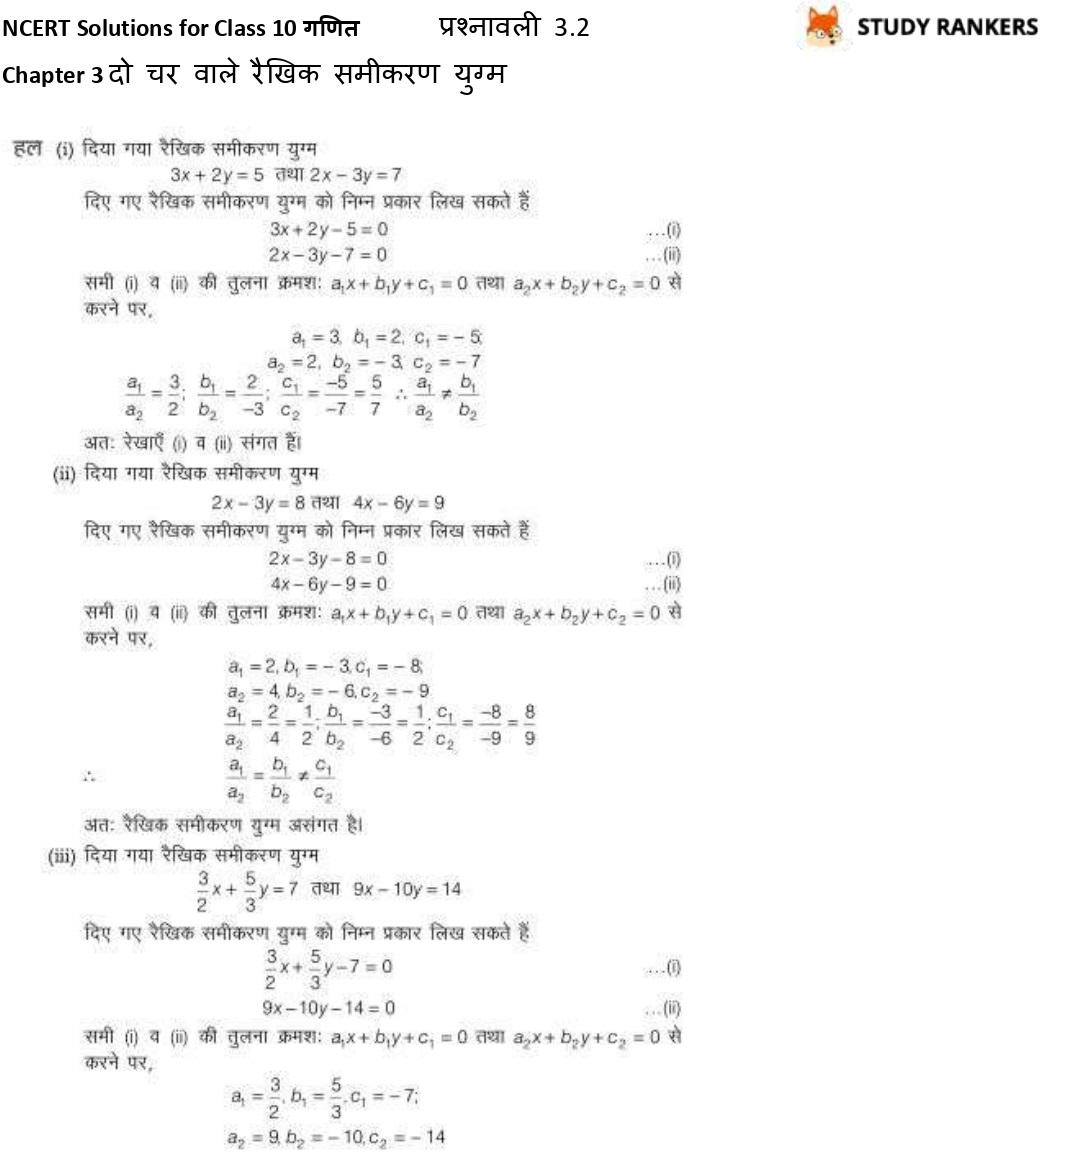 NCERT Solutions for Class 10 Maths Chapter 3 दो चर वाले रैखिक समीकरण युग्म प्रश्नावली 3.2 Part 5